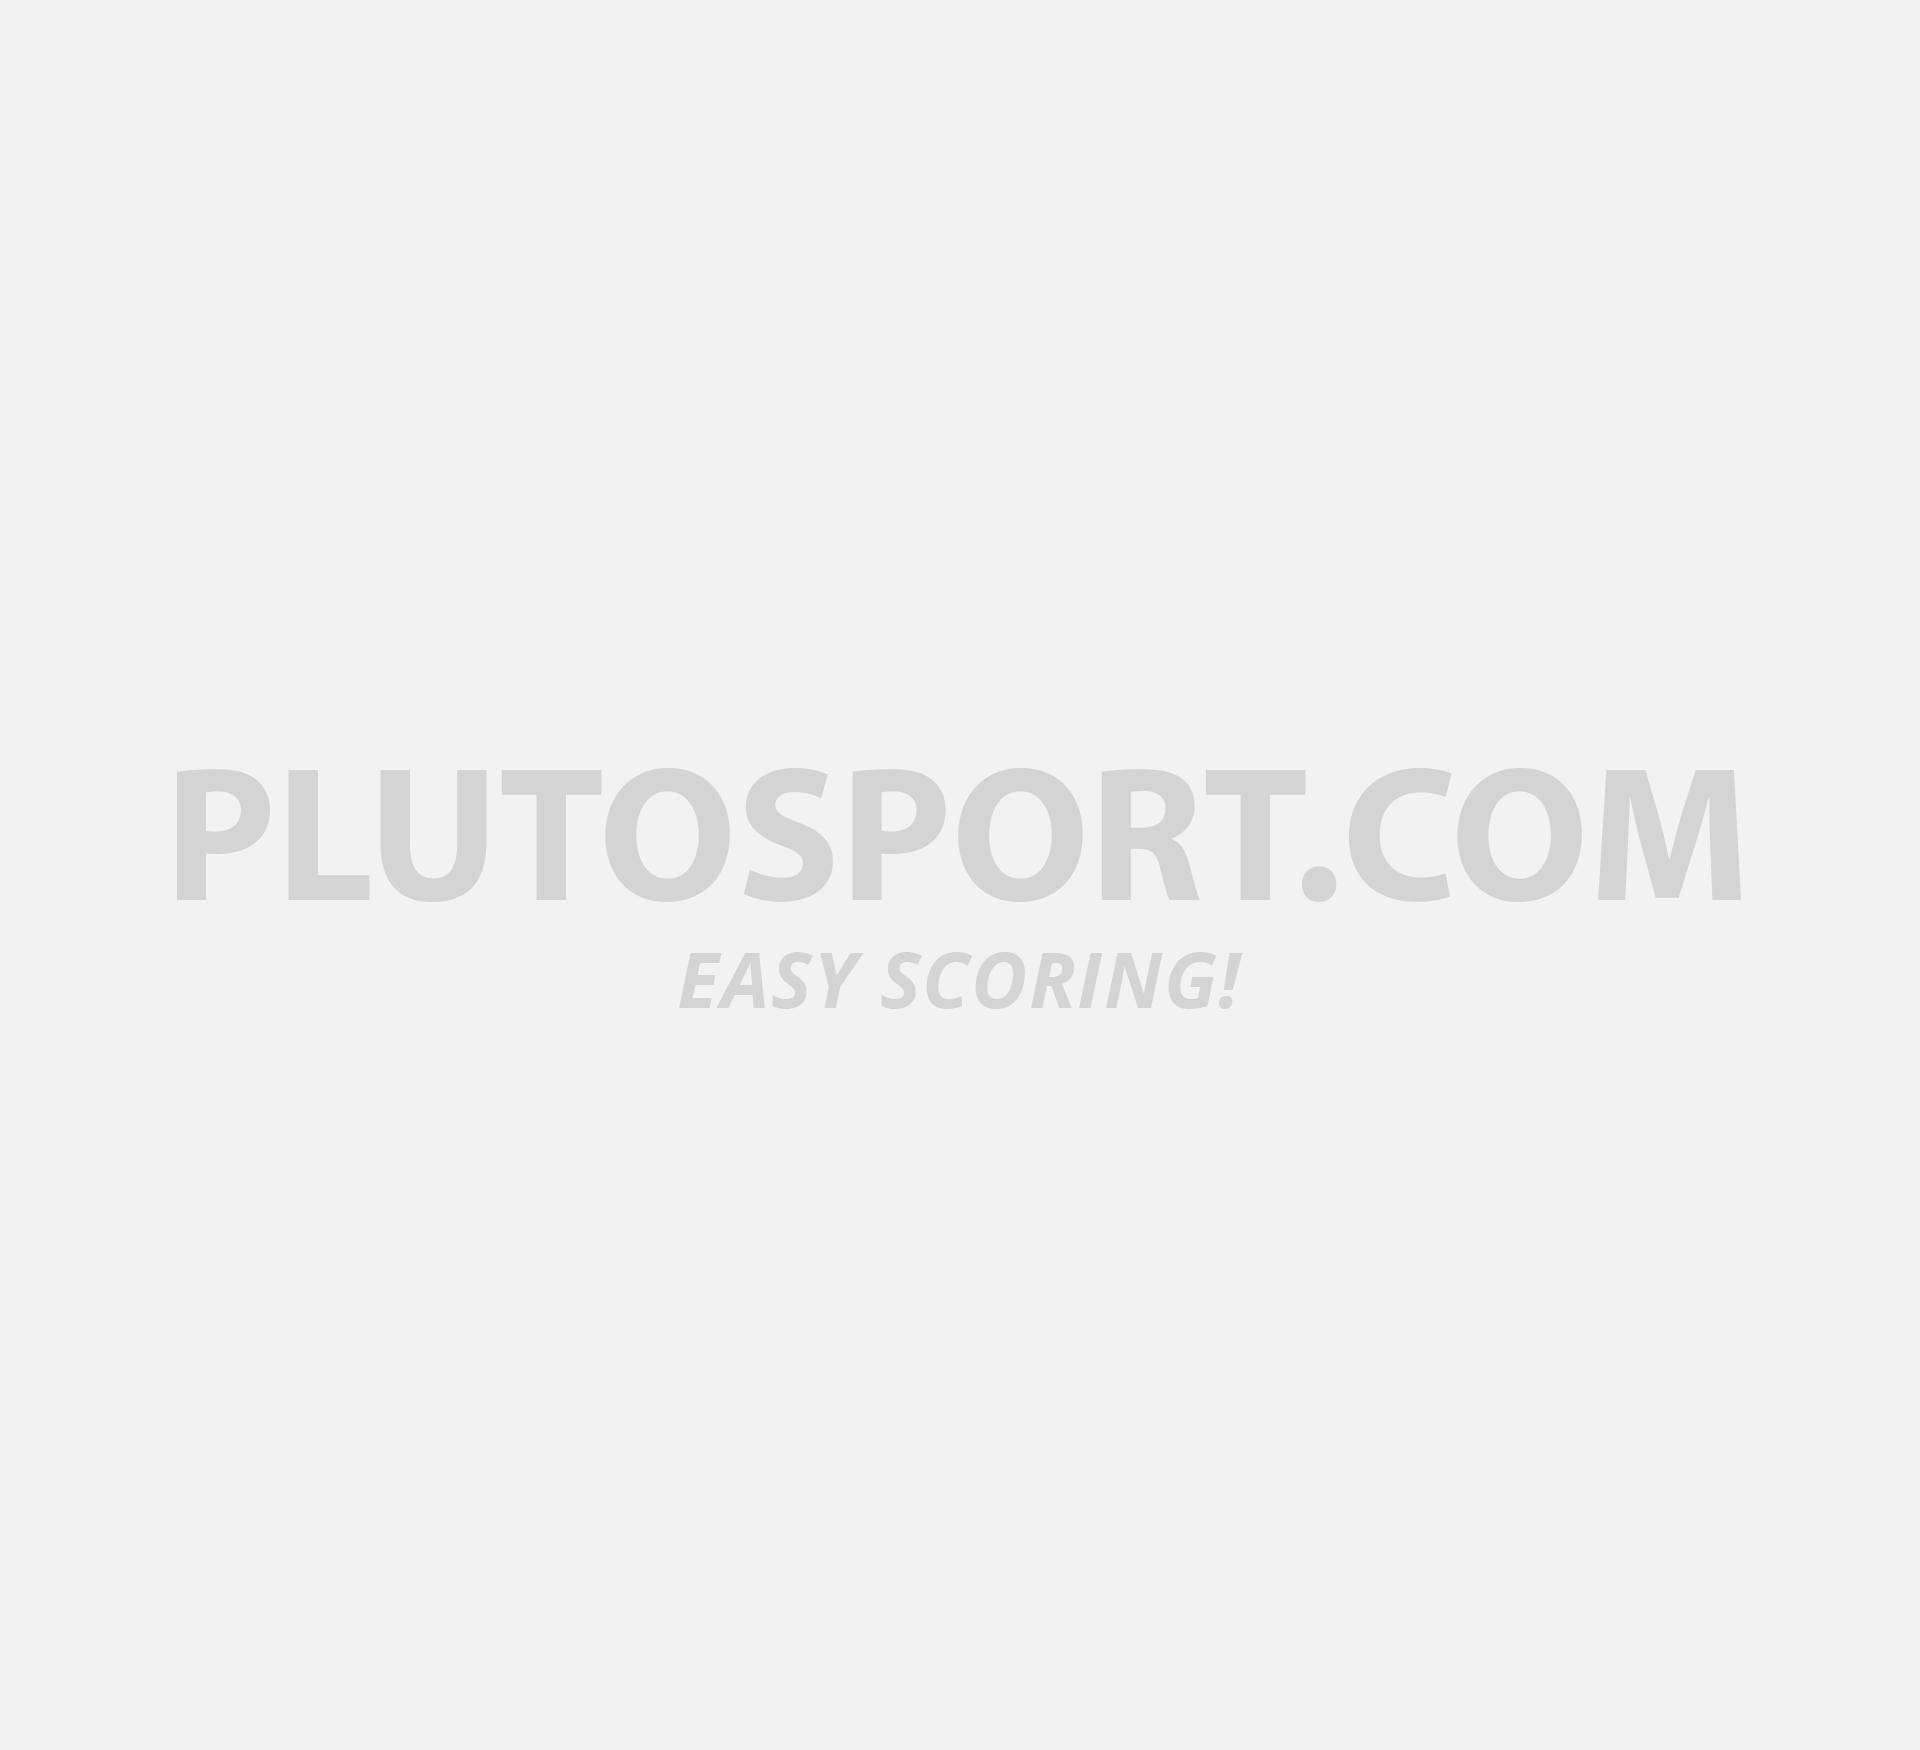 Vans Authentic Lo Pro Sneakers Junior - Sneakers - Shoes - Lifestyle -  Sports  c91f4058e